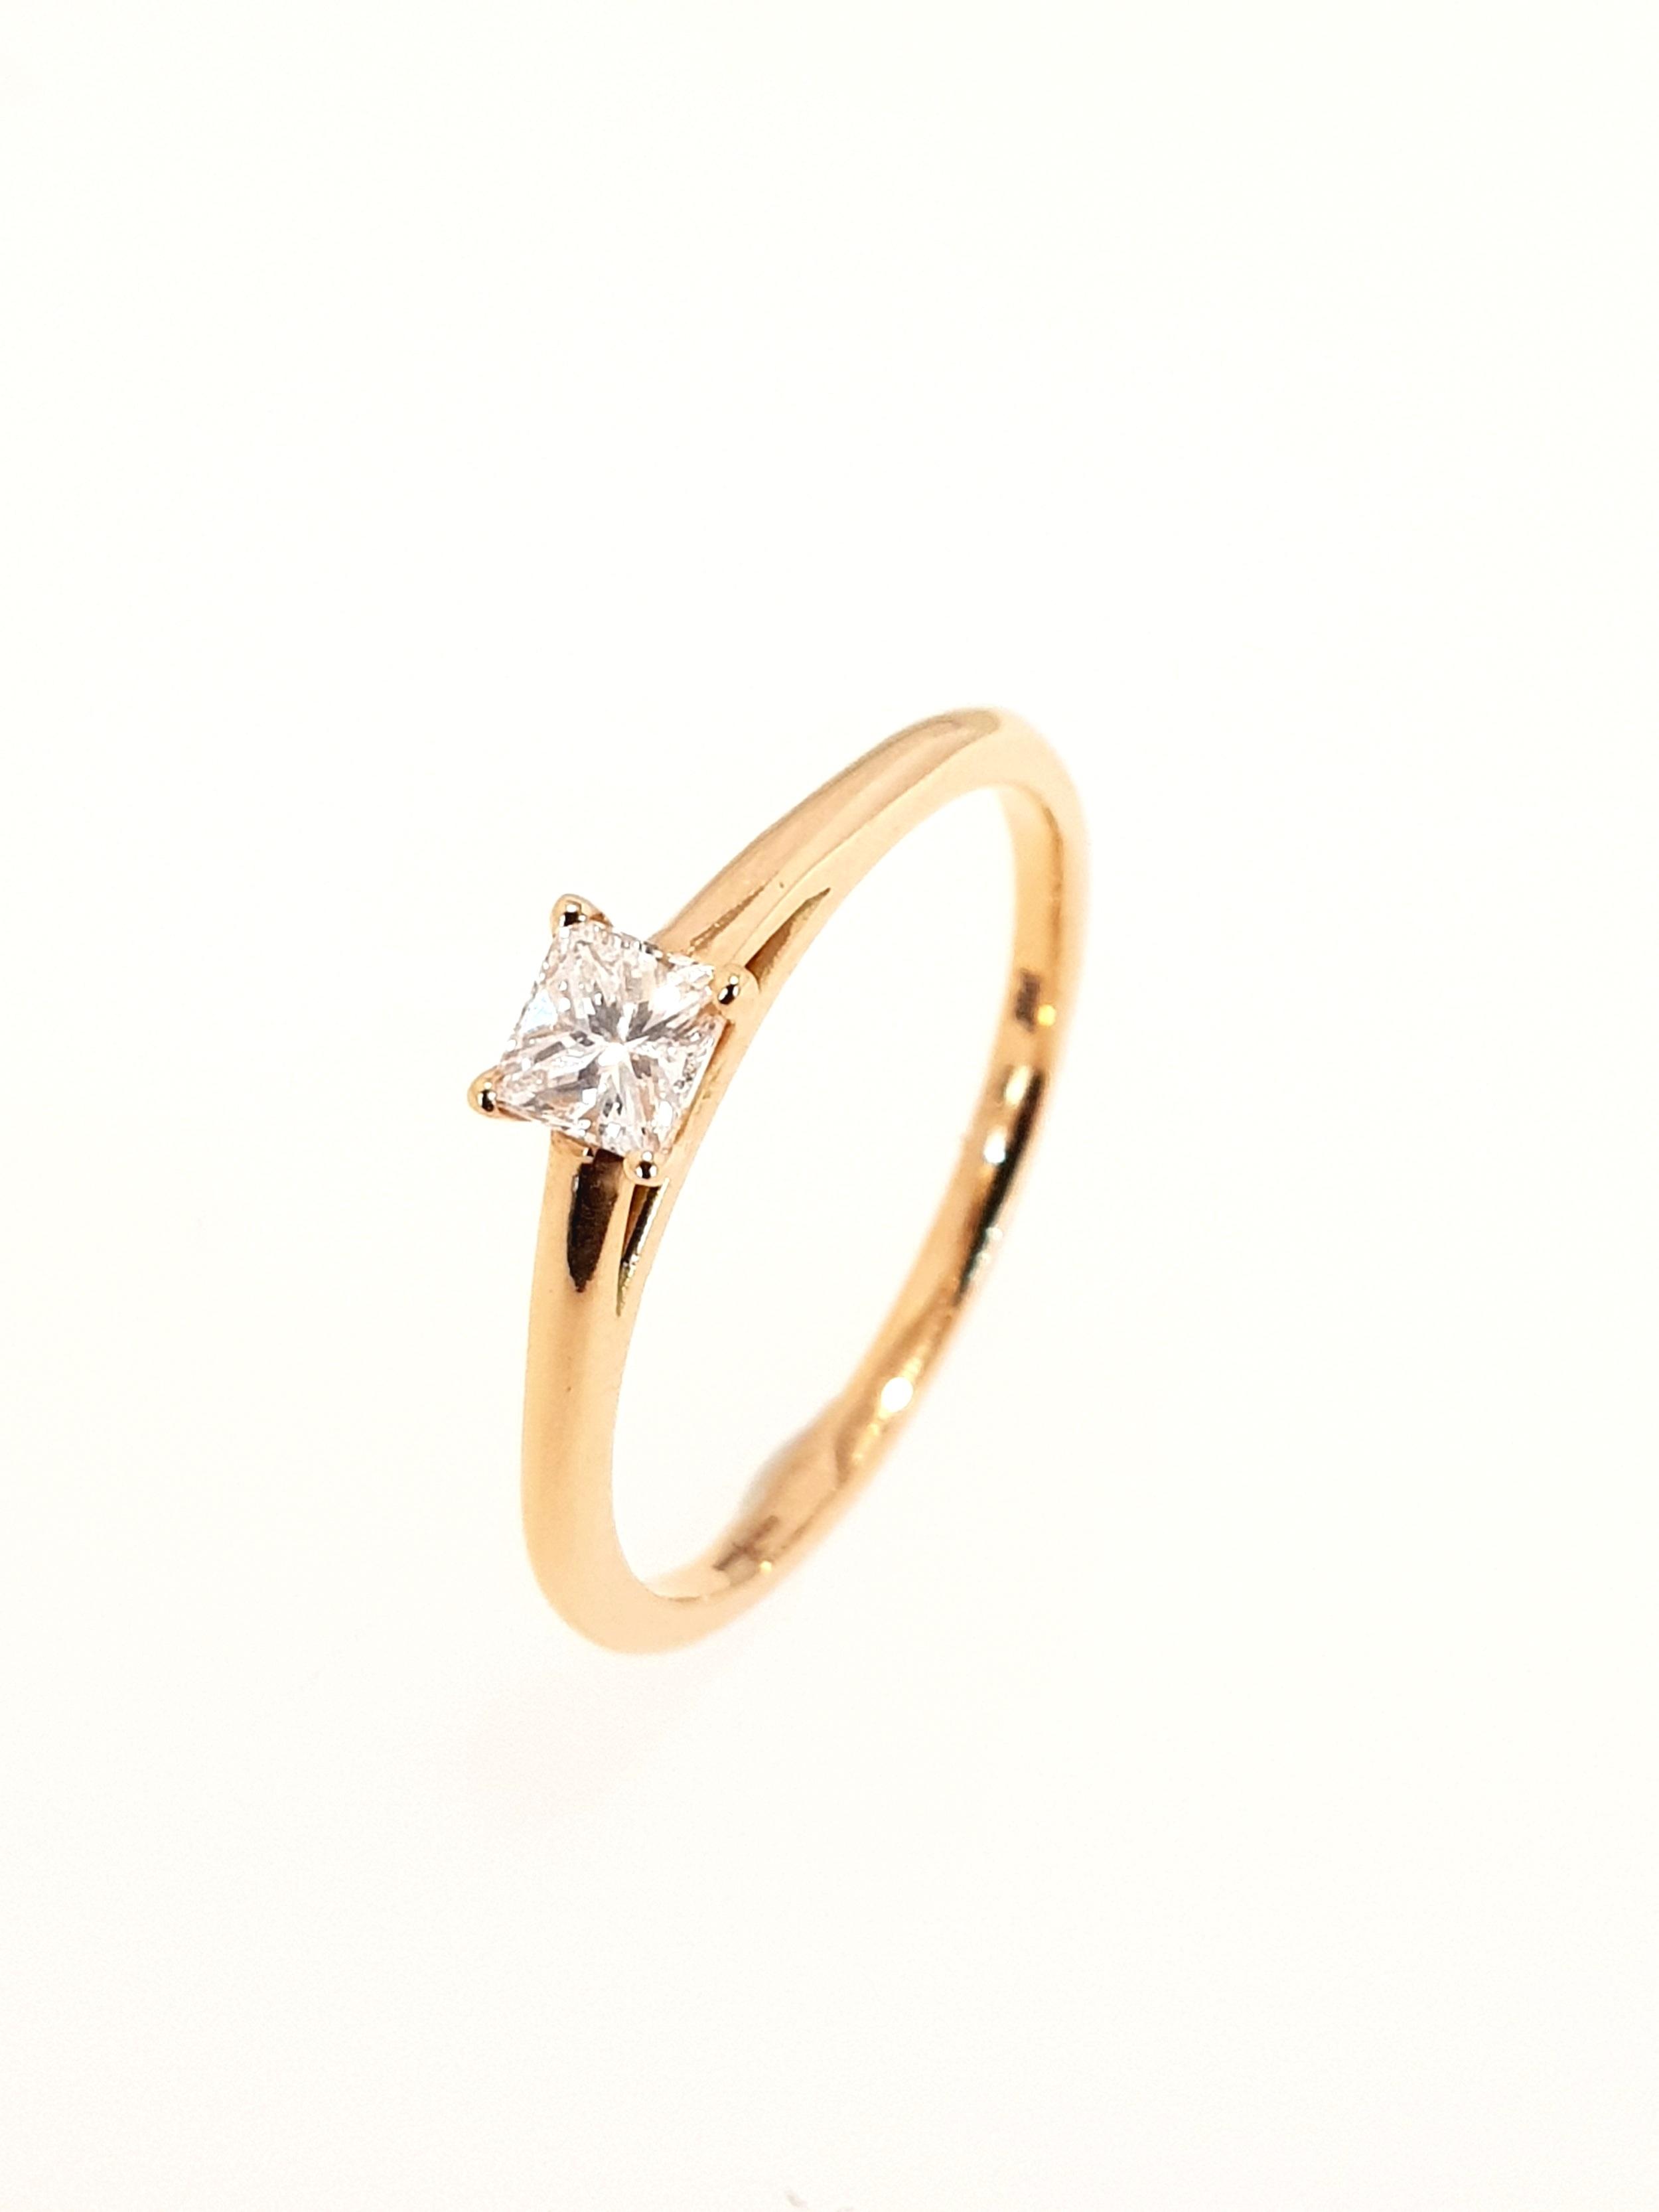 18ct Rose Gold Diamond Ring, Princess Cut  .25ct, G, Si1  Stock Code: N8522  £1100